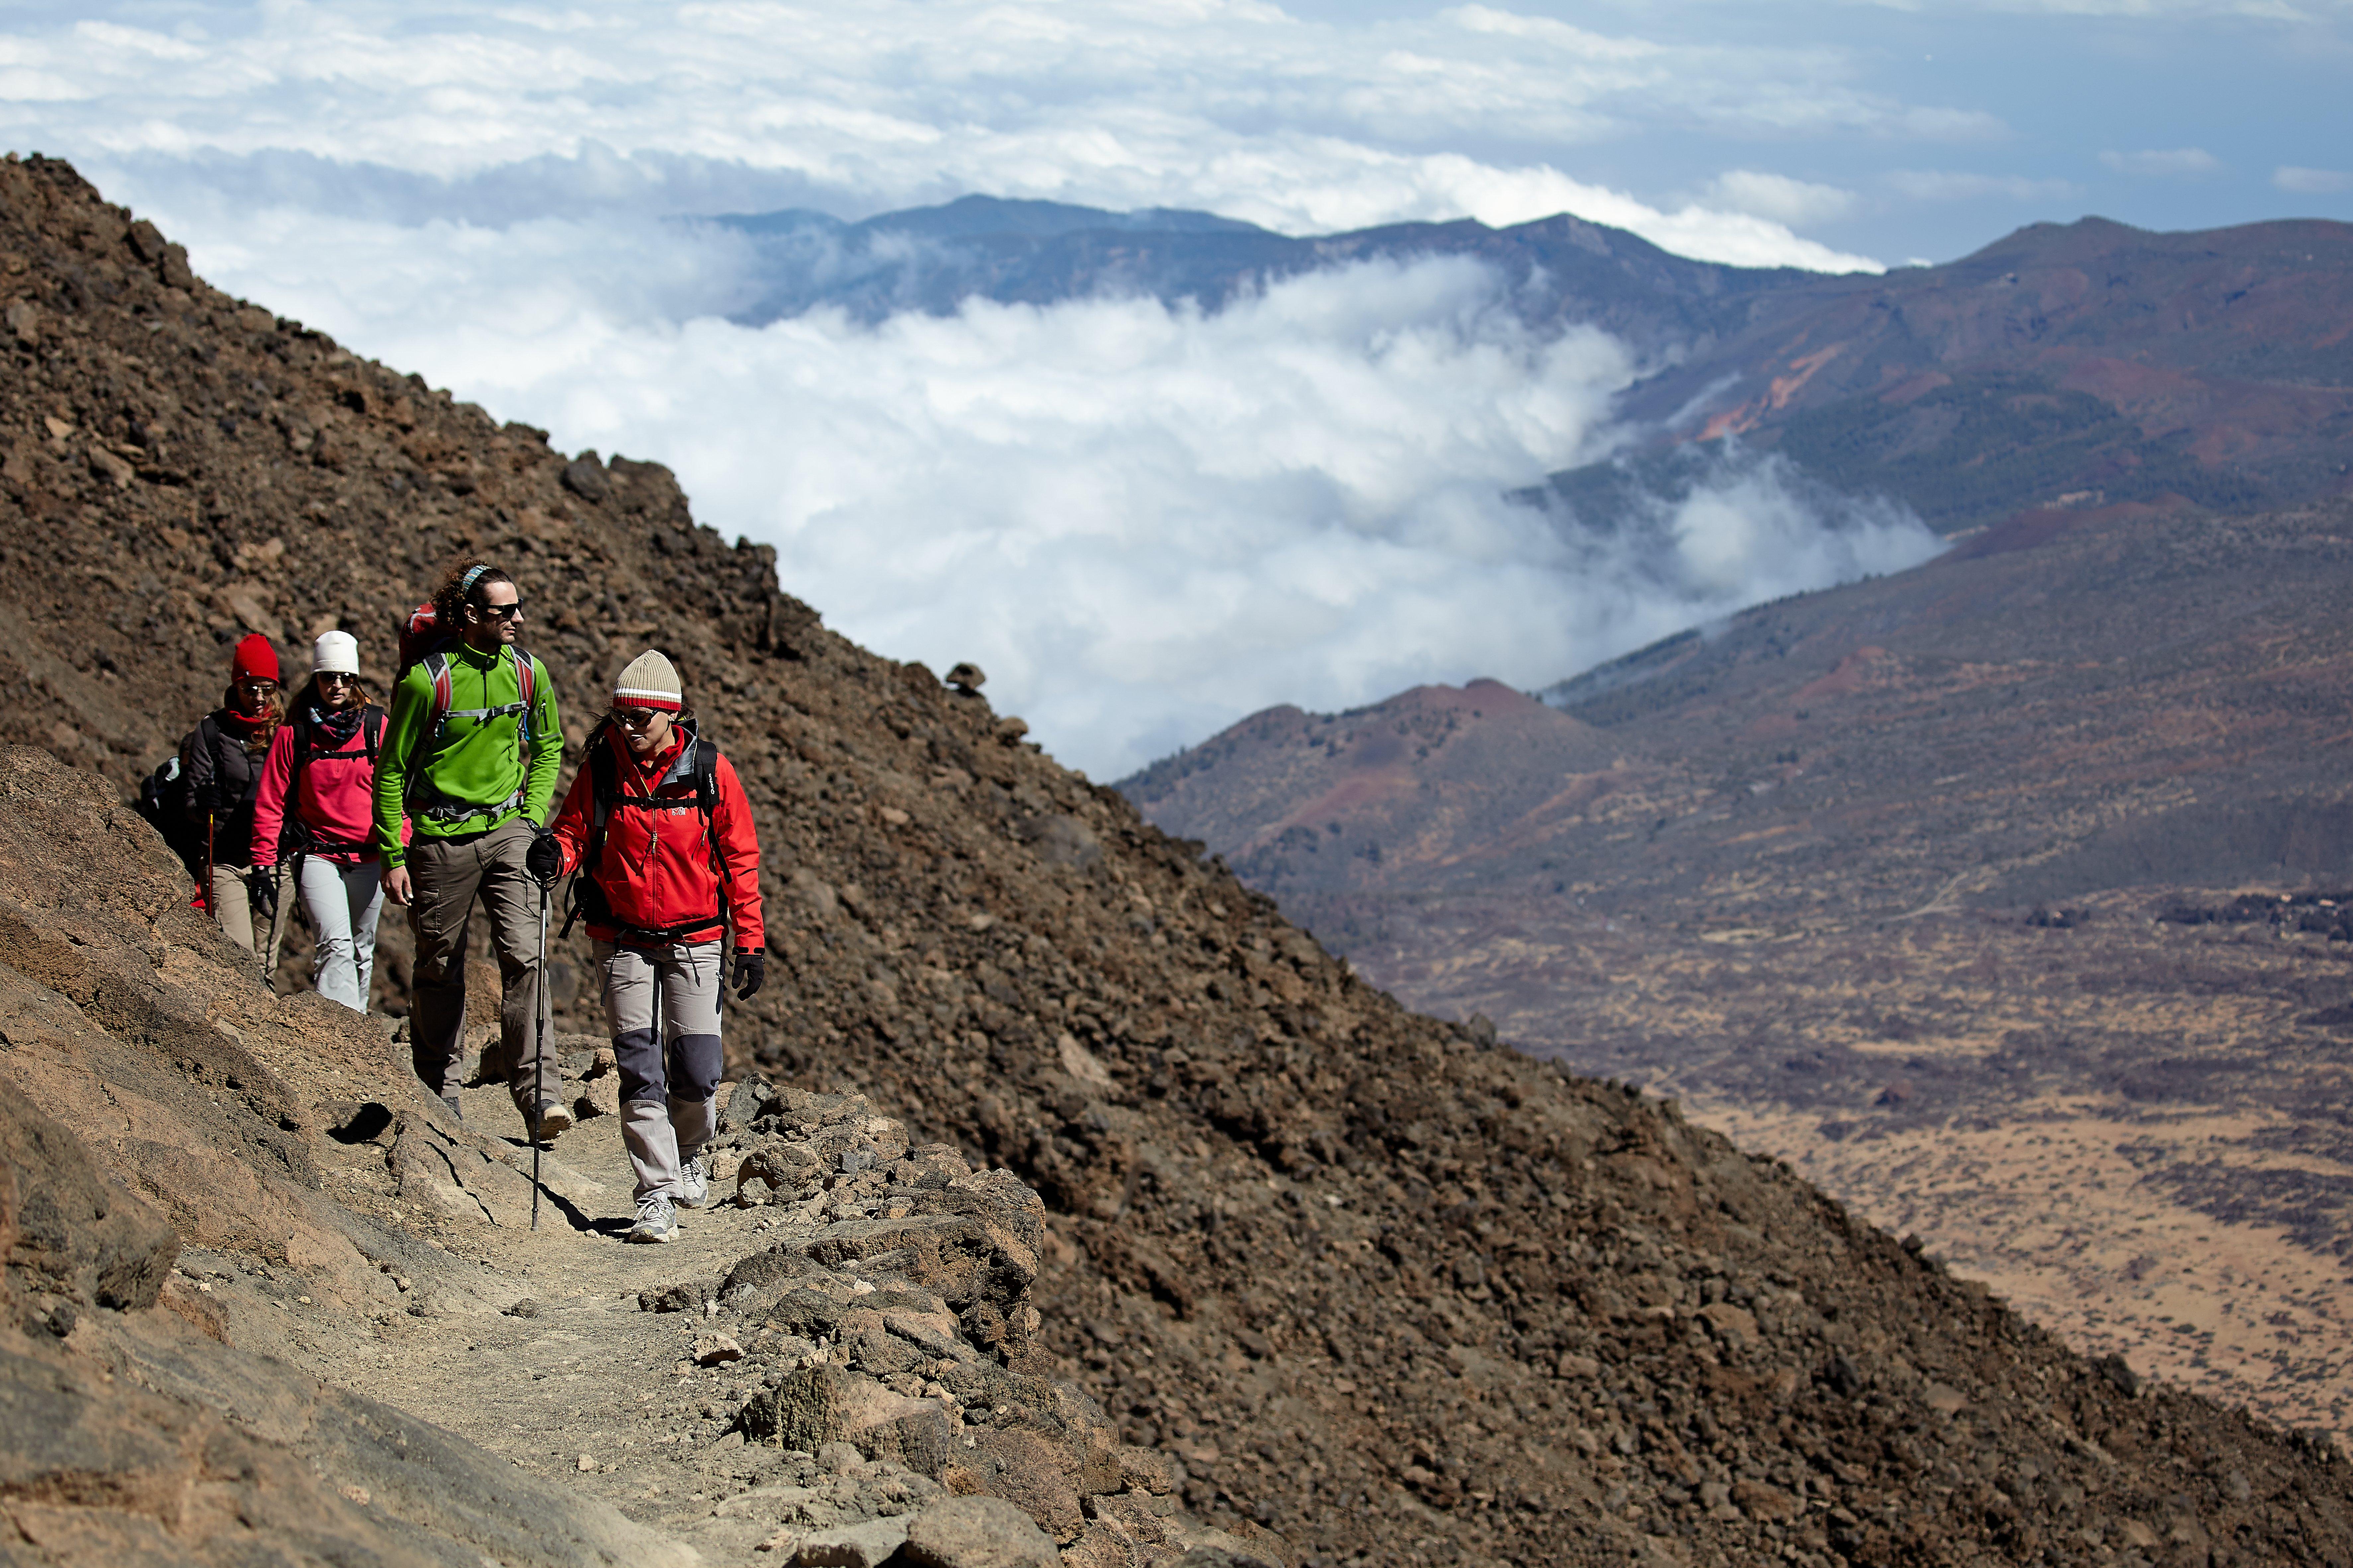 Getting Mount Teide permit online